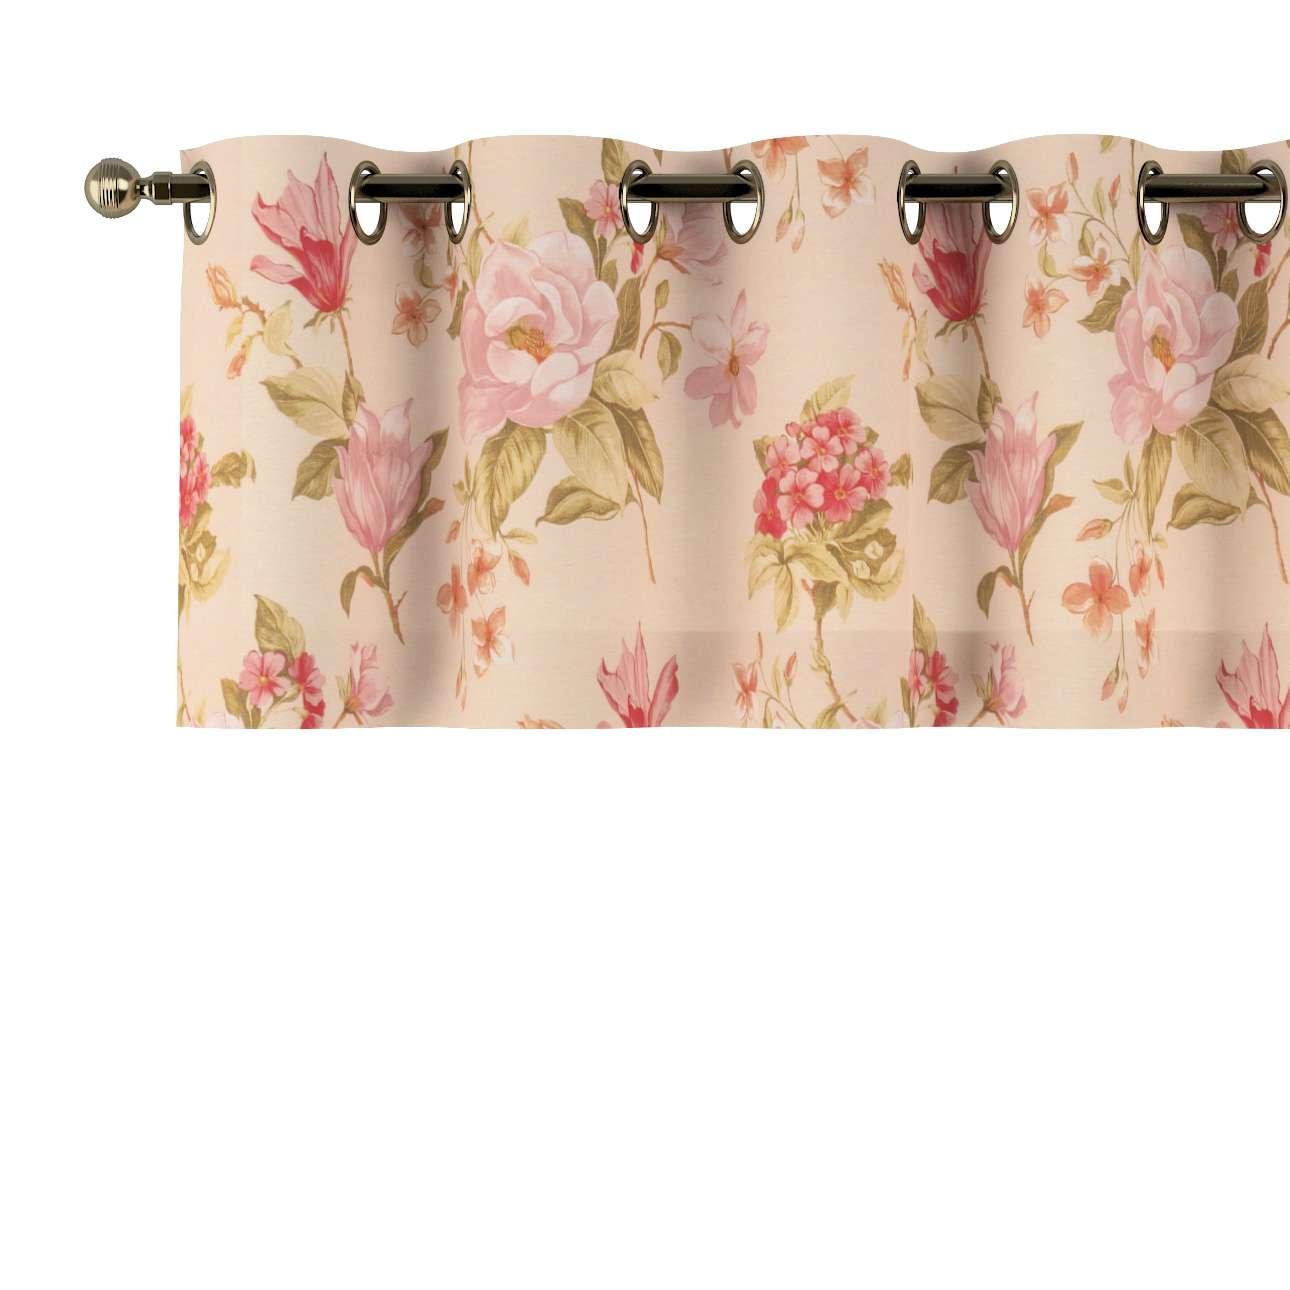 Lambrekin na kółkach 130x40cm w kolekcji Londres, tkanina: 123-05